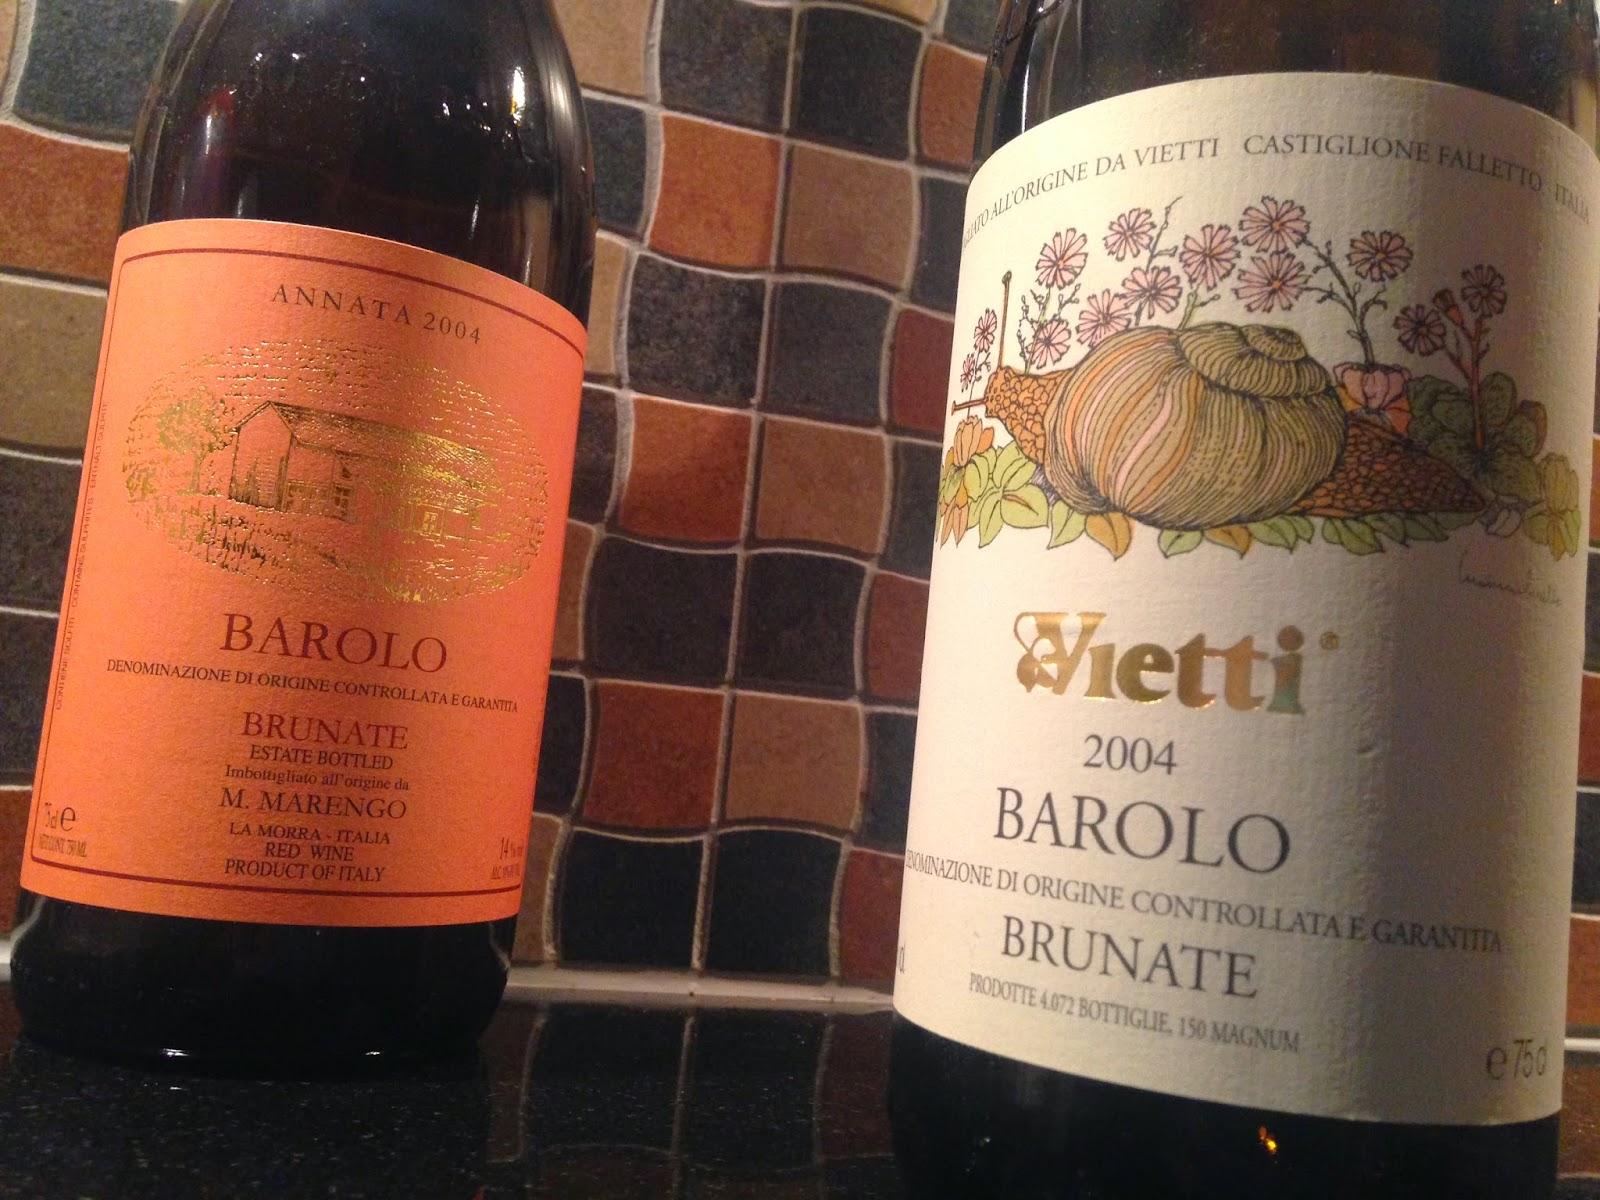 Barolo Brunate 2004 2004 Barolo Brunate From